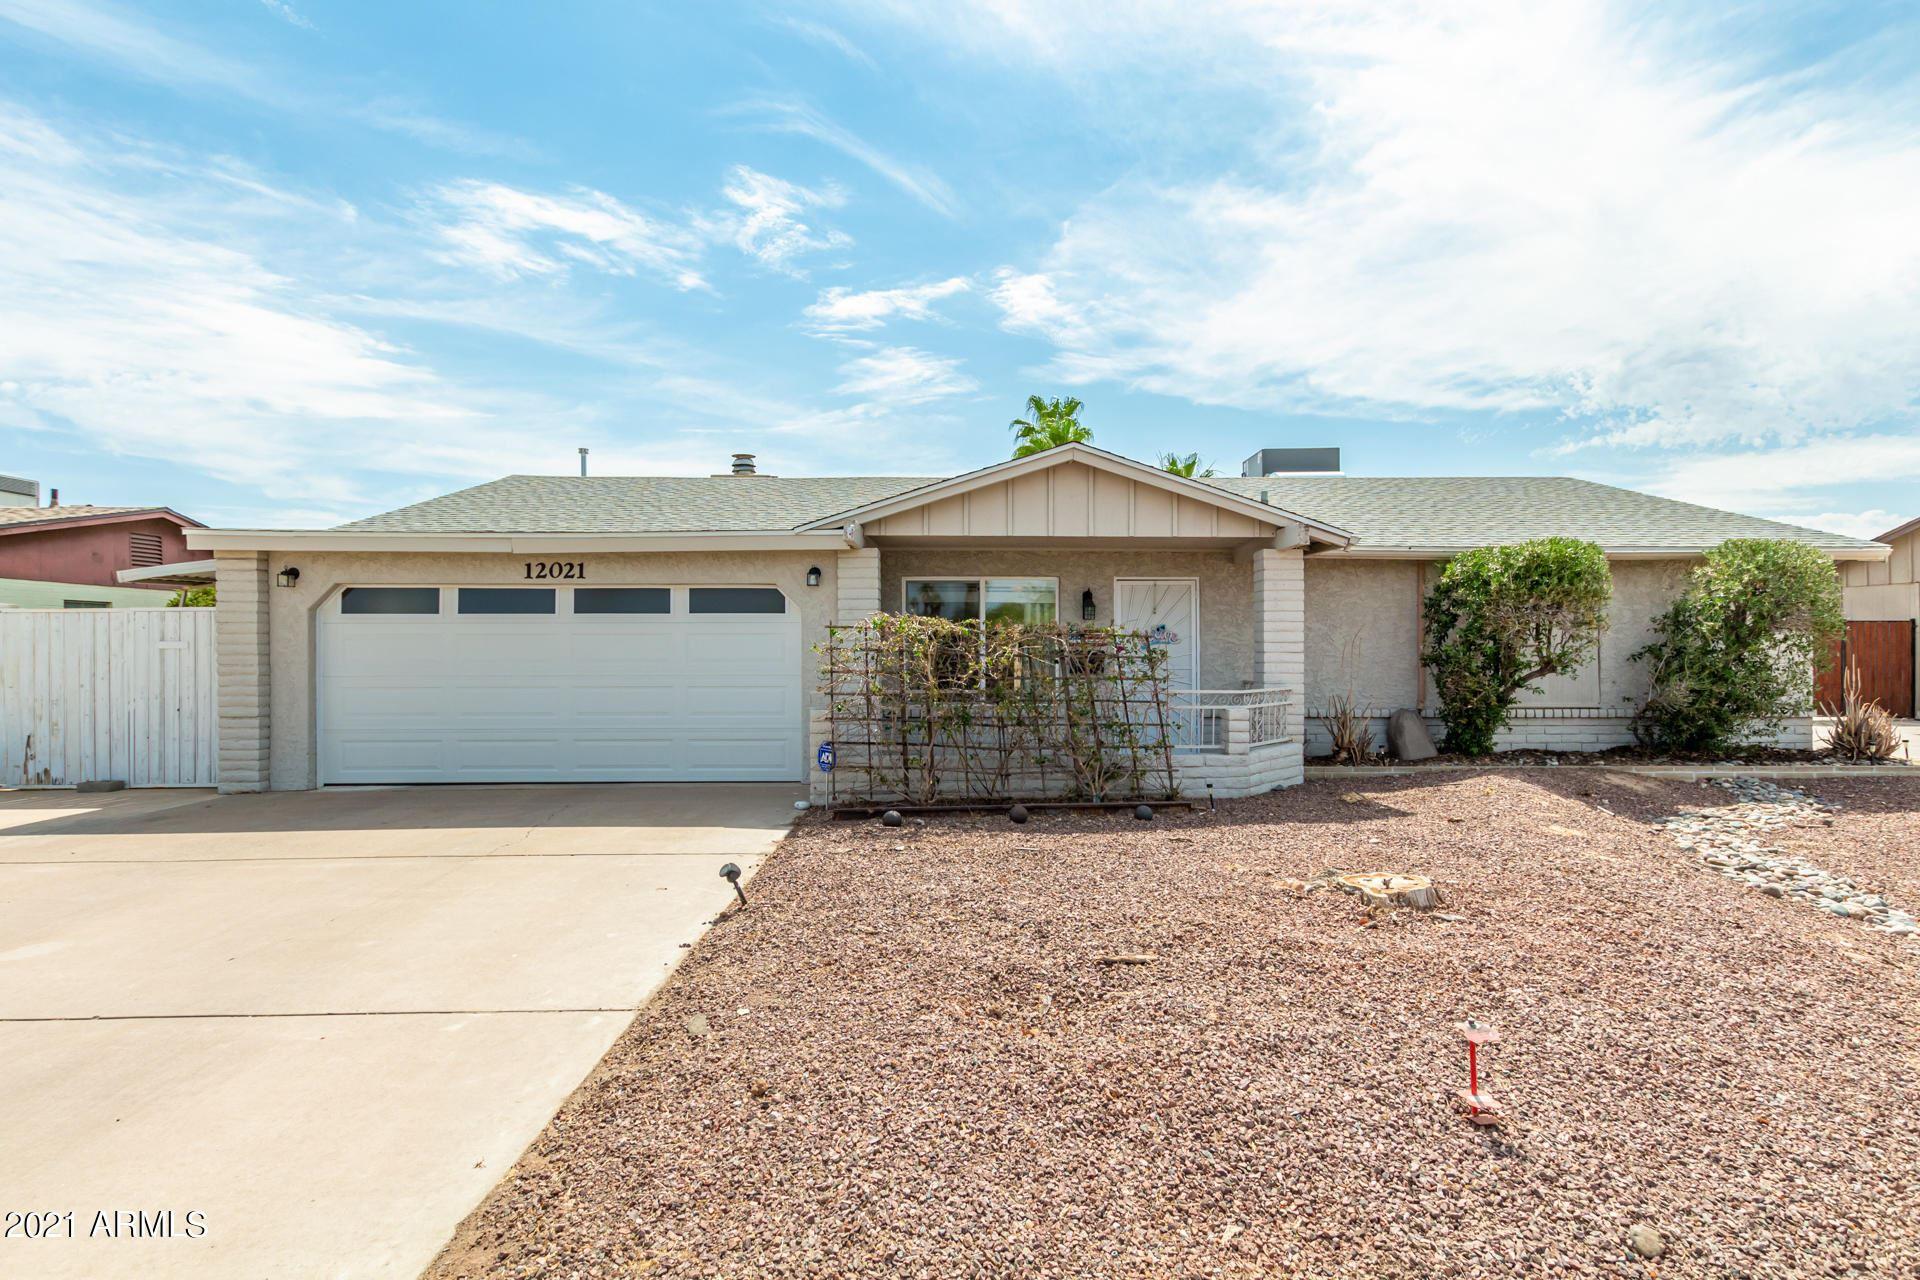 12021 N 35TH Street, Phoenix, AZ 85028 - MLS#: 6255602